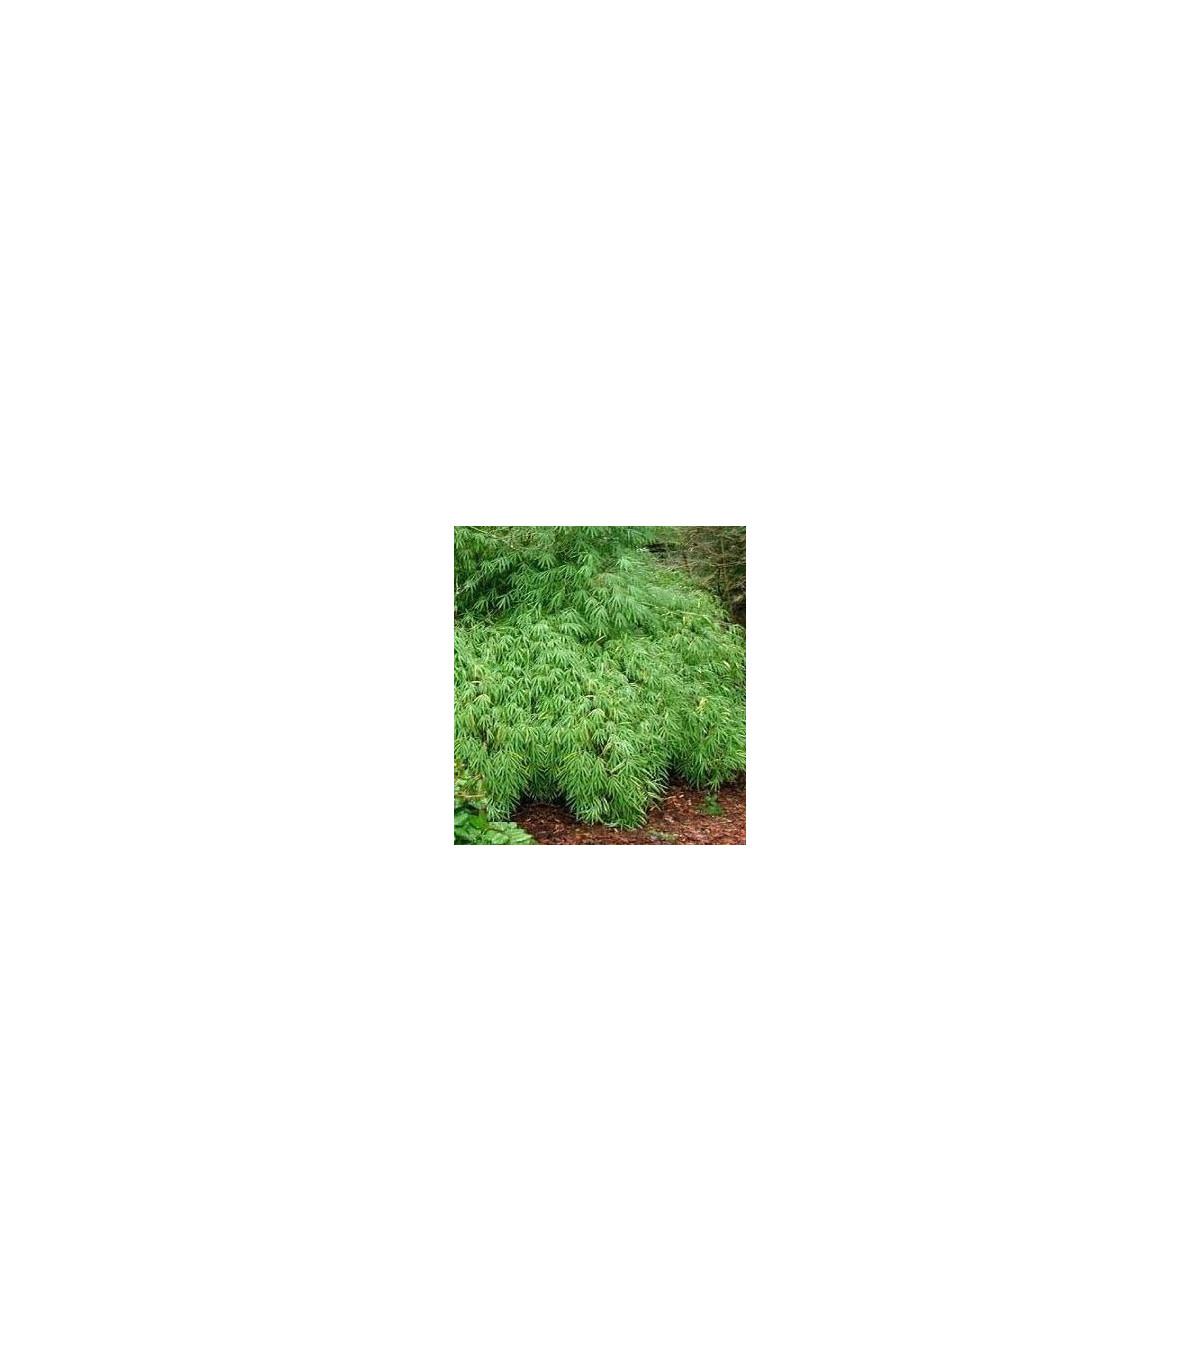 Bambus horský - Rákosovec - 3 x - Fargesia fungosa - prodej semen bambusů